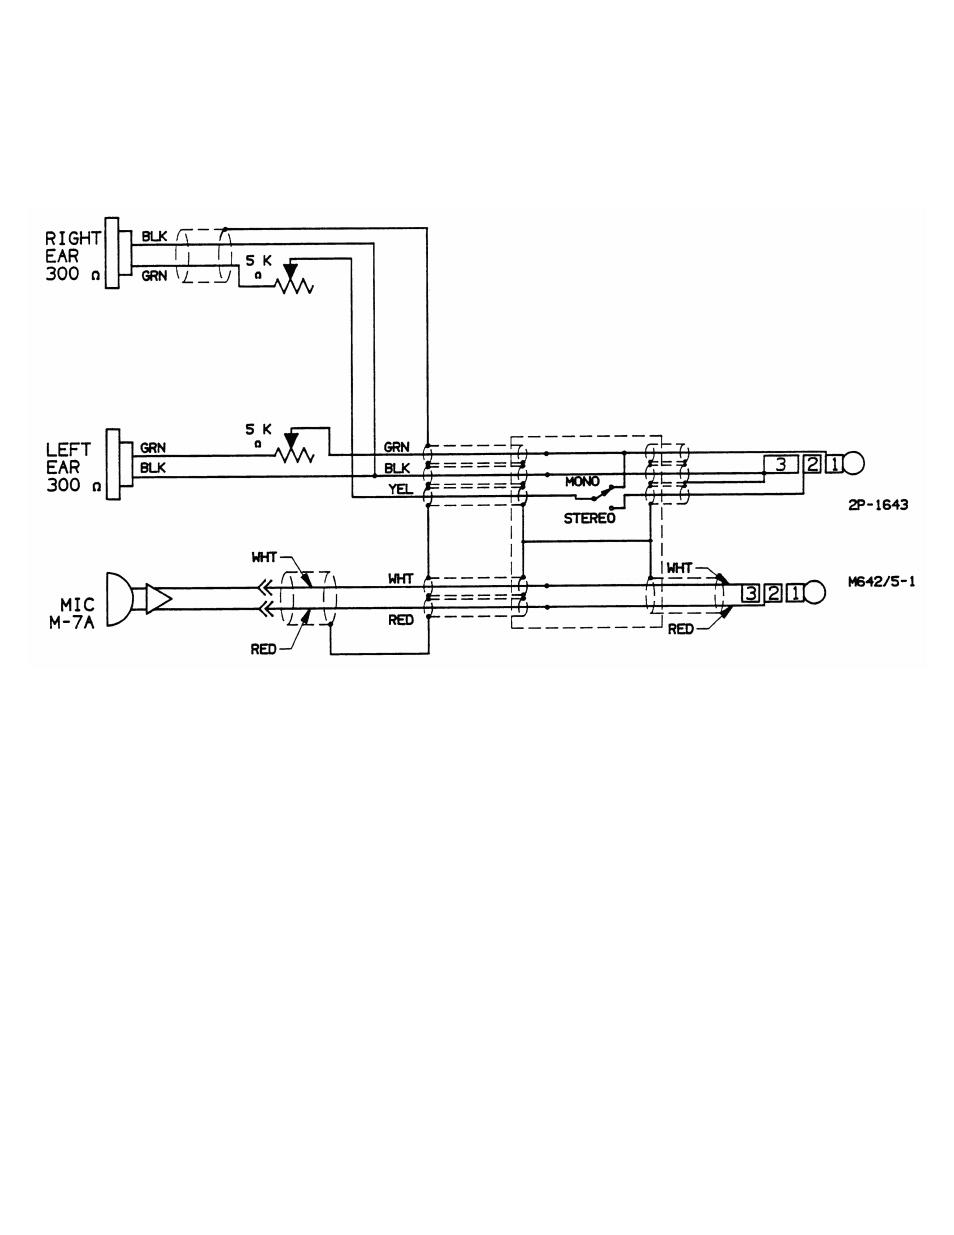 Clark Wiring Diagram | Wiring Diagram on